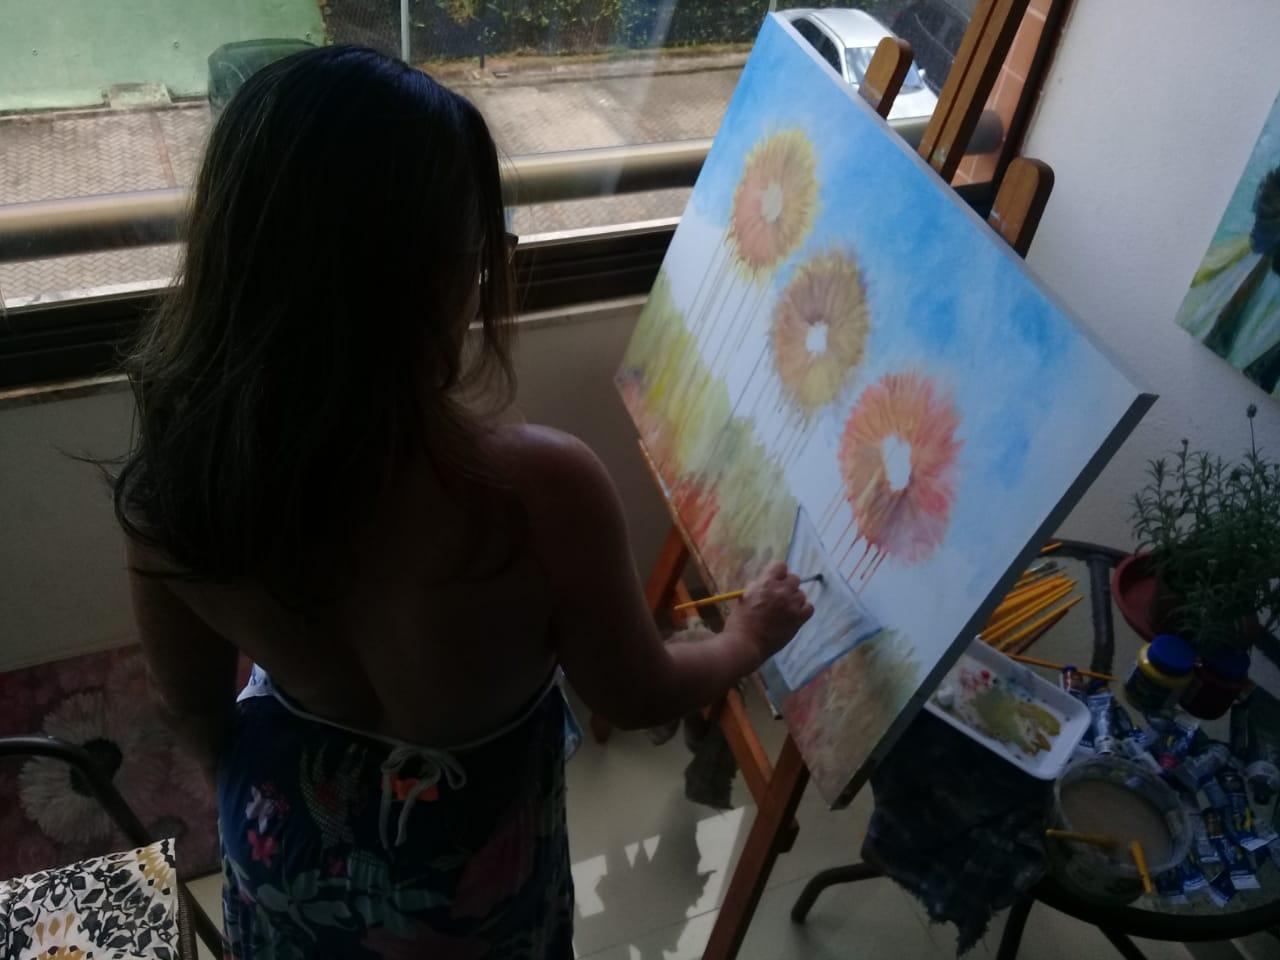 Galeria Anakiss, artes_brasileiras,2020,